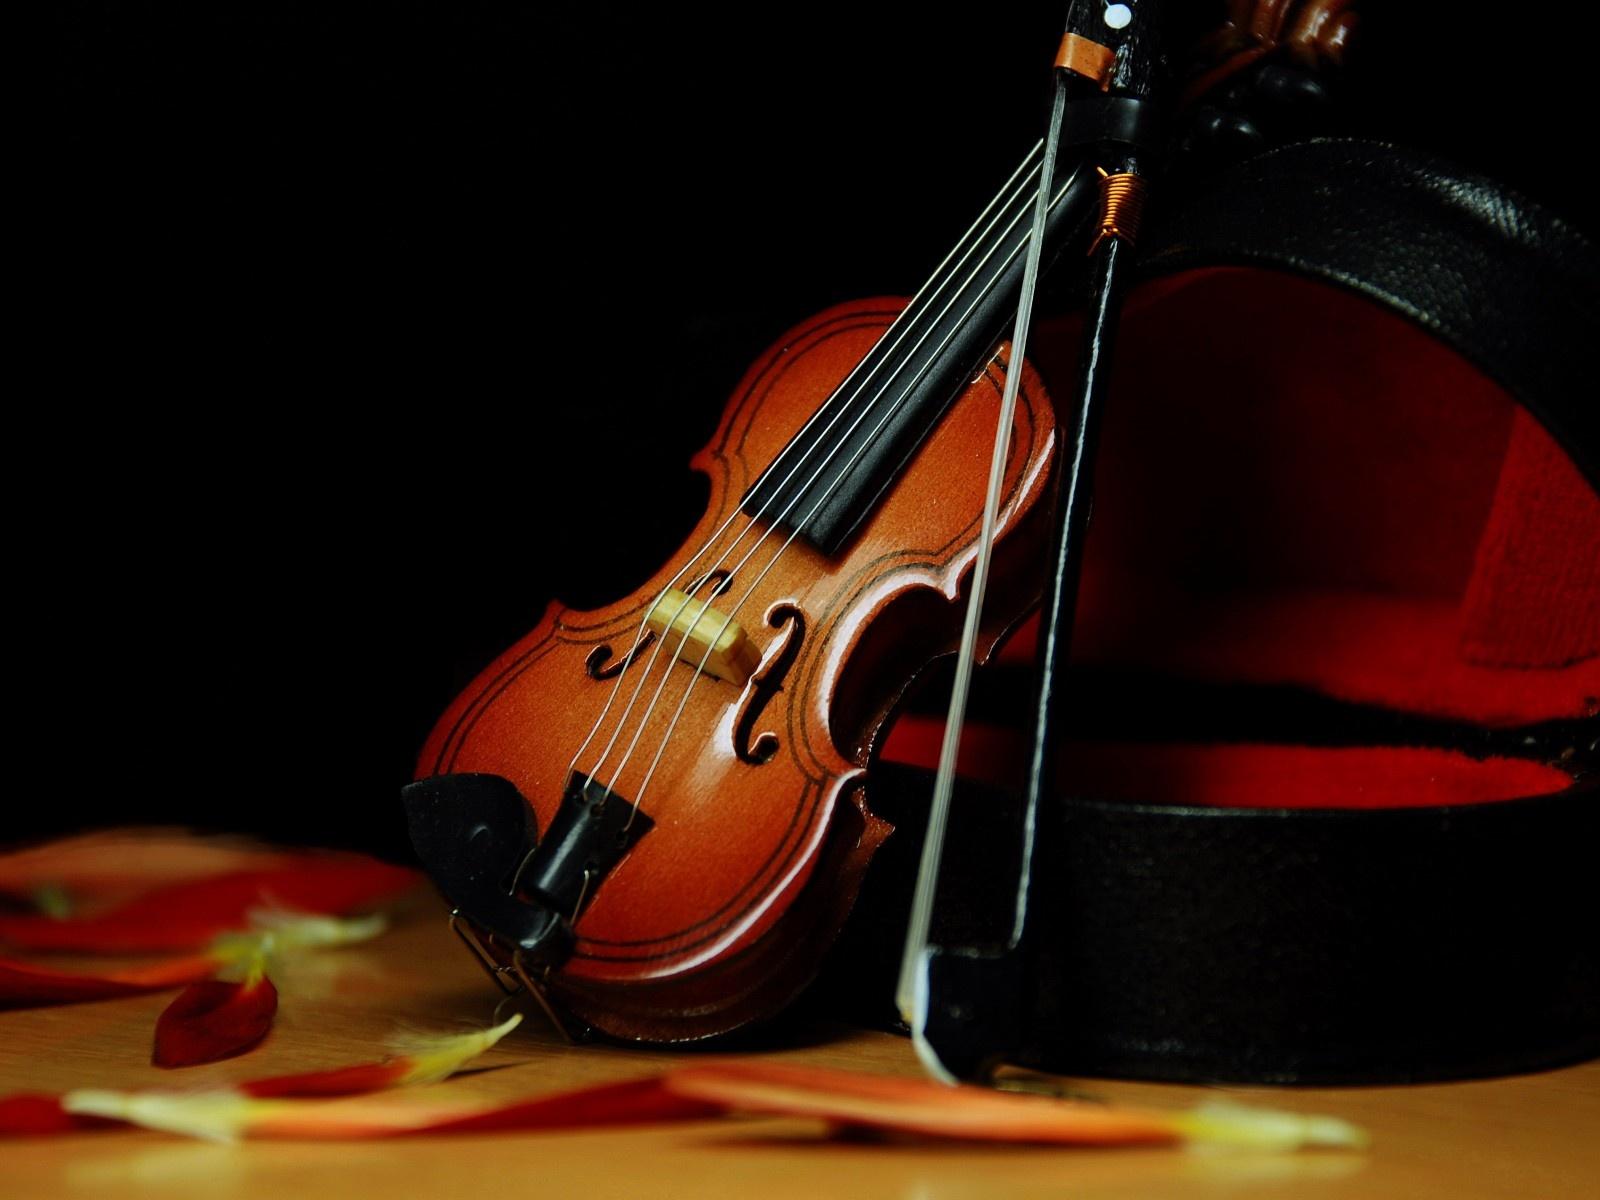 Free Violin Wallpaper 34036 1680x1050 px